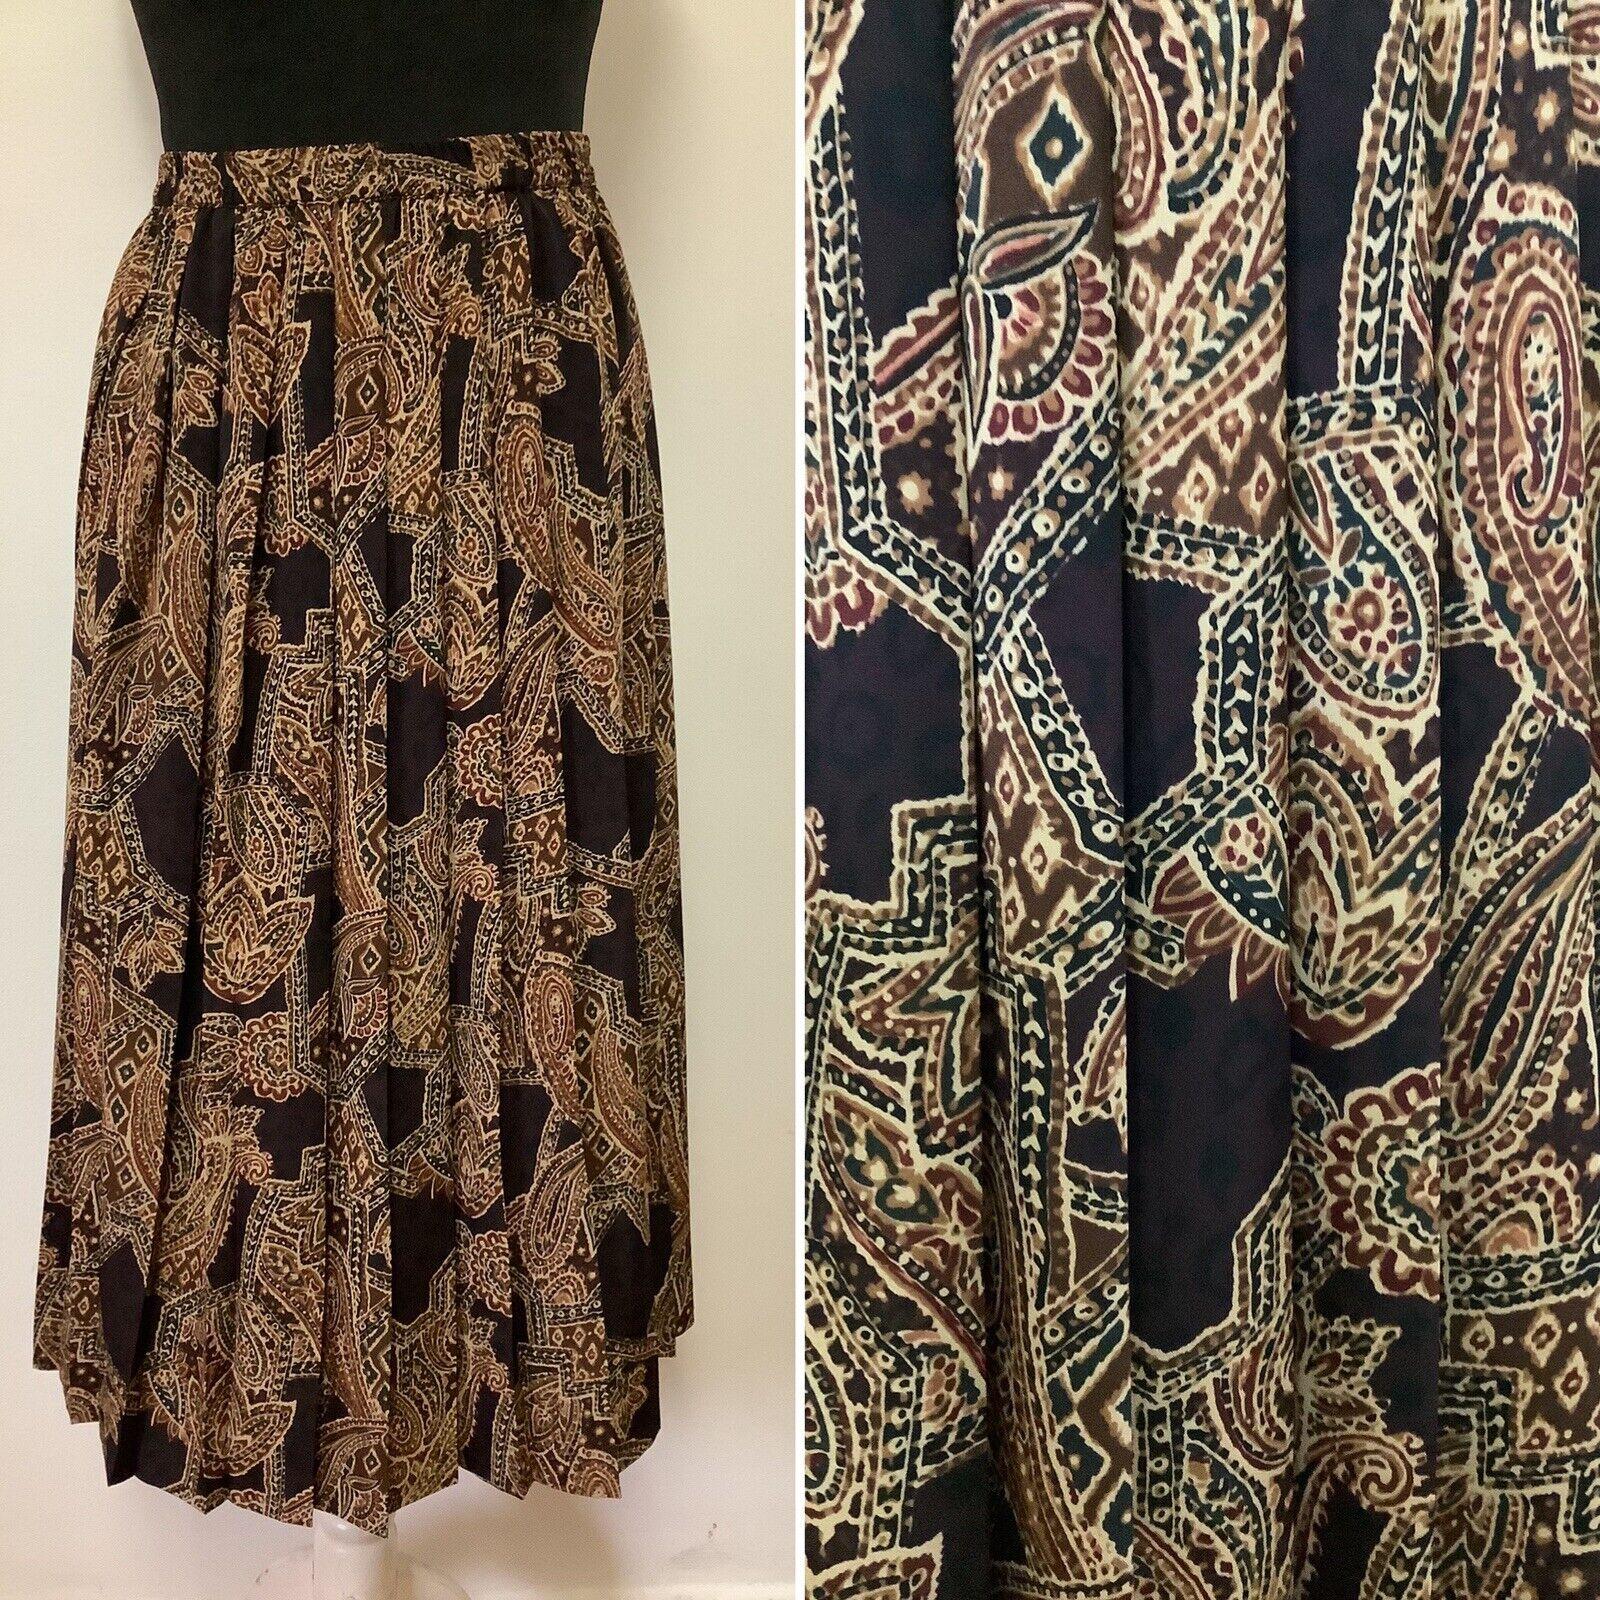 Vintage Skirt Size 8-10 Pleated Paisley & Leopard Print